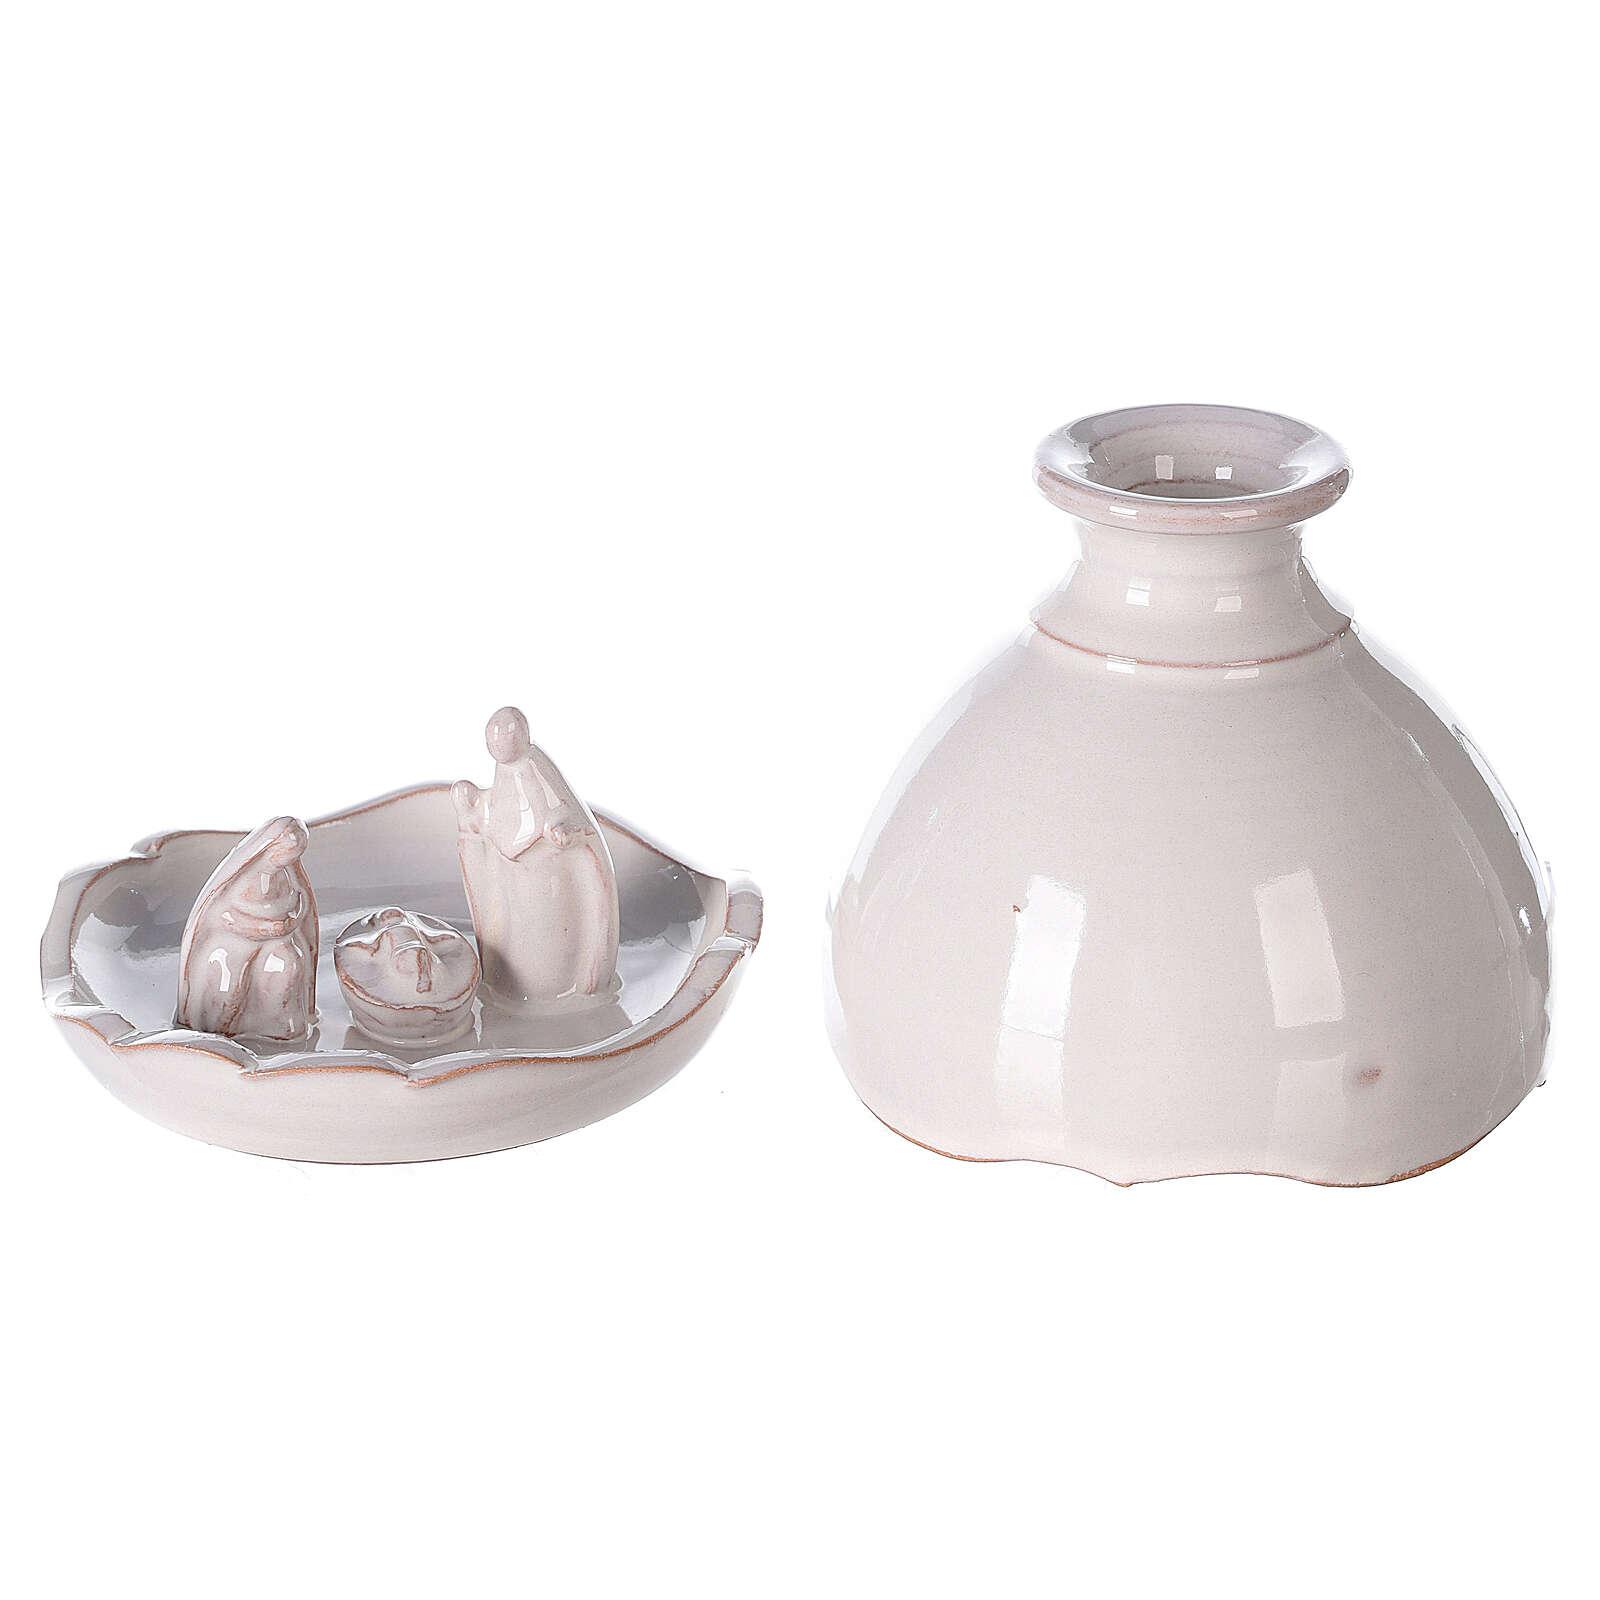 Miniature Holy Family set in openable vase white Deruta terracotta 10 cm 4